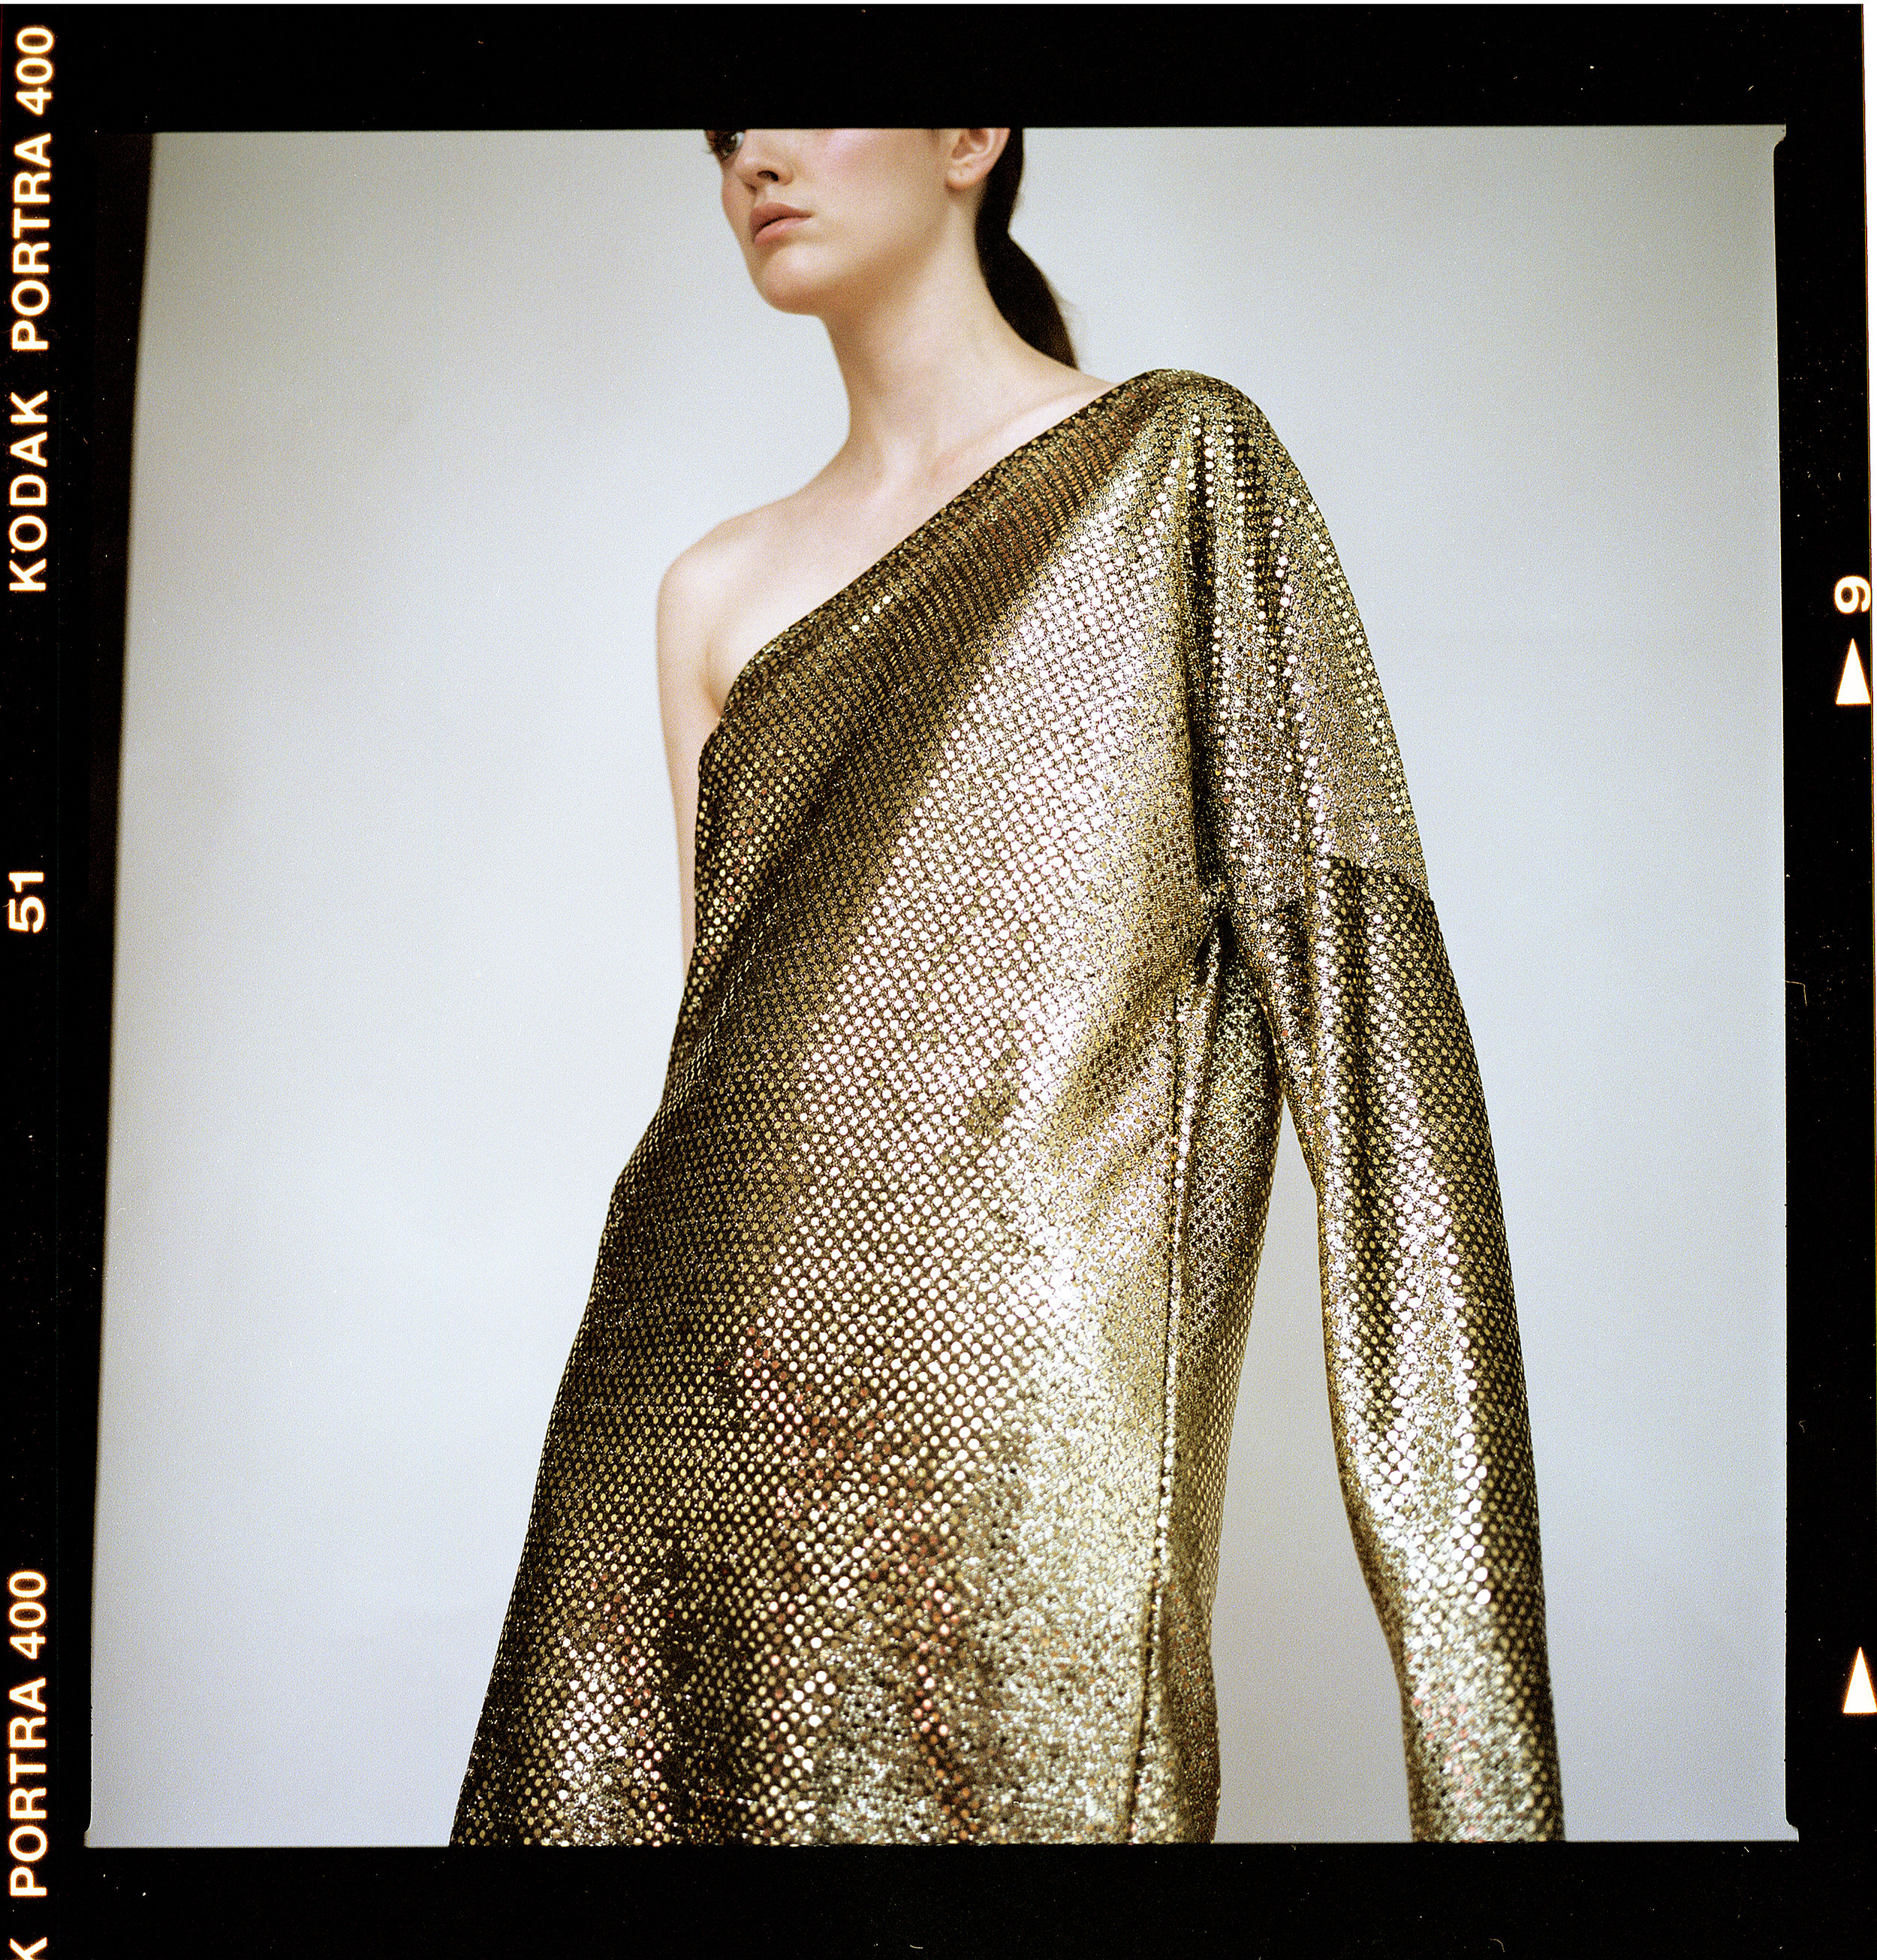 dress LUOMO STRANO, heels aluminium covered PRADA